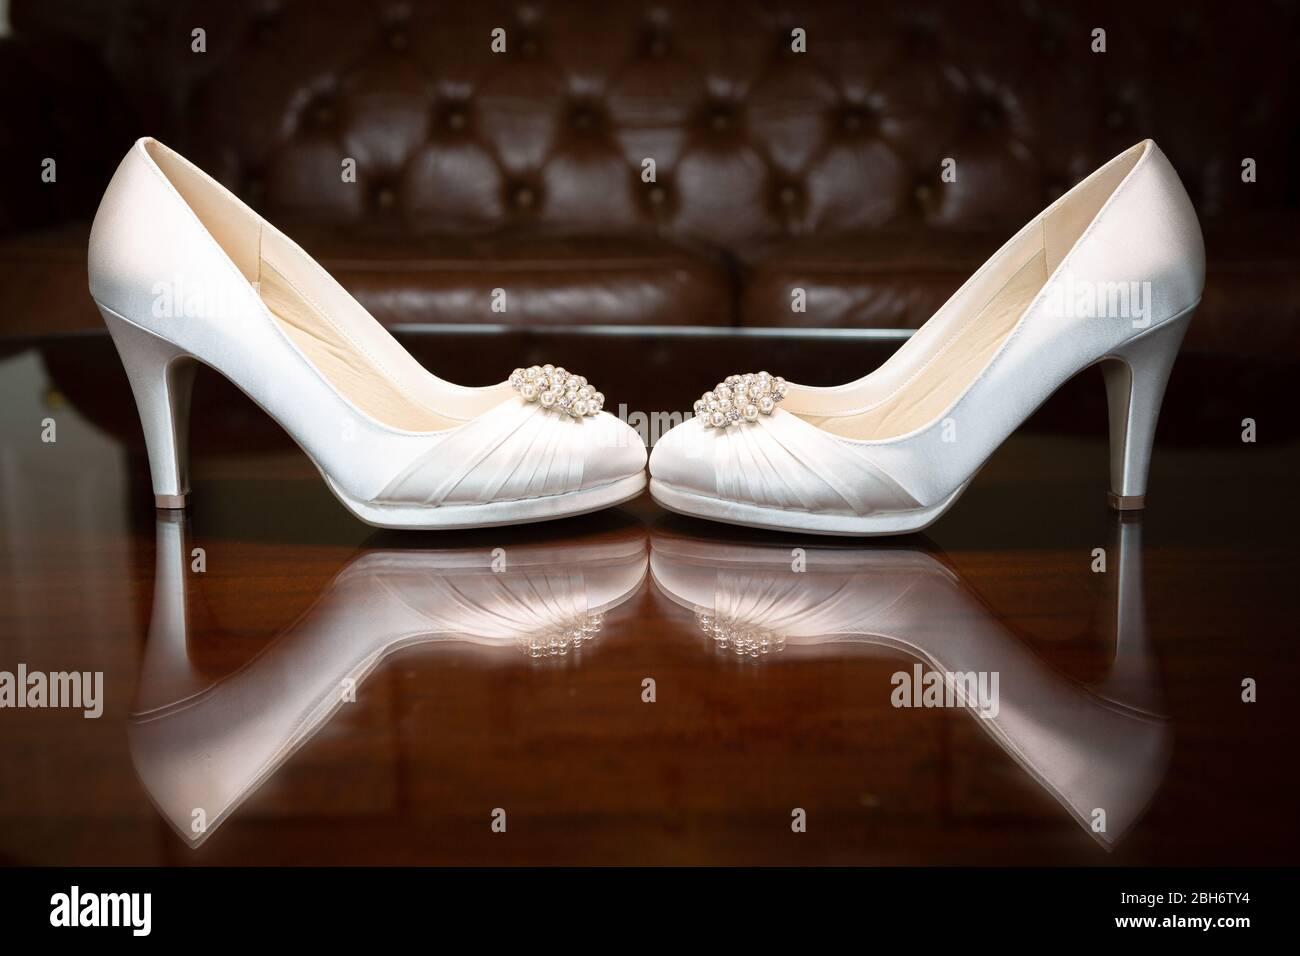 Luxury Wedding Shoes sitting on a reflective surface Stock Photo